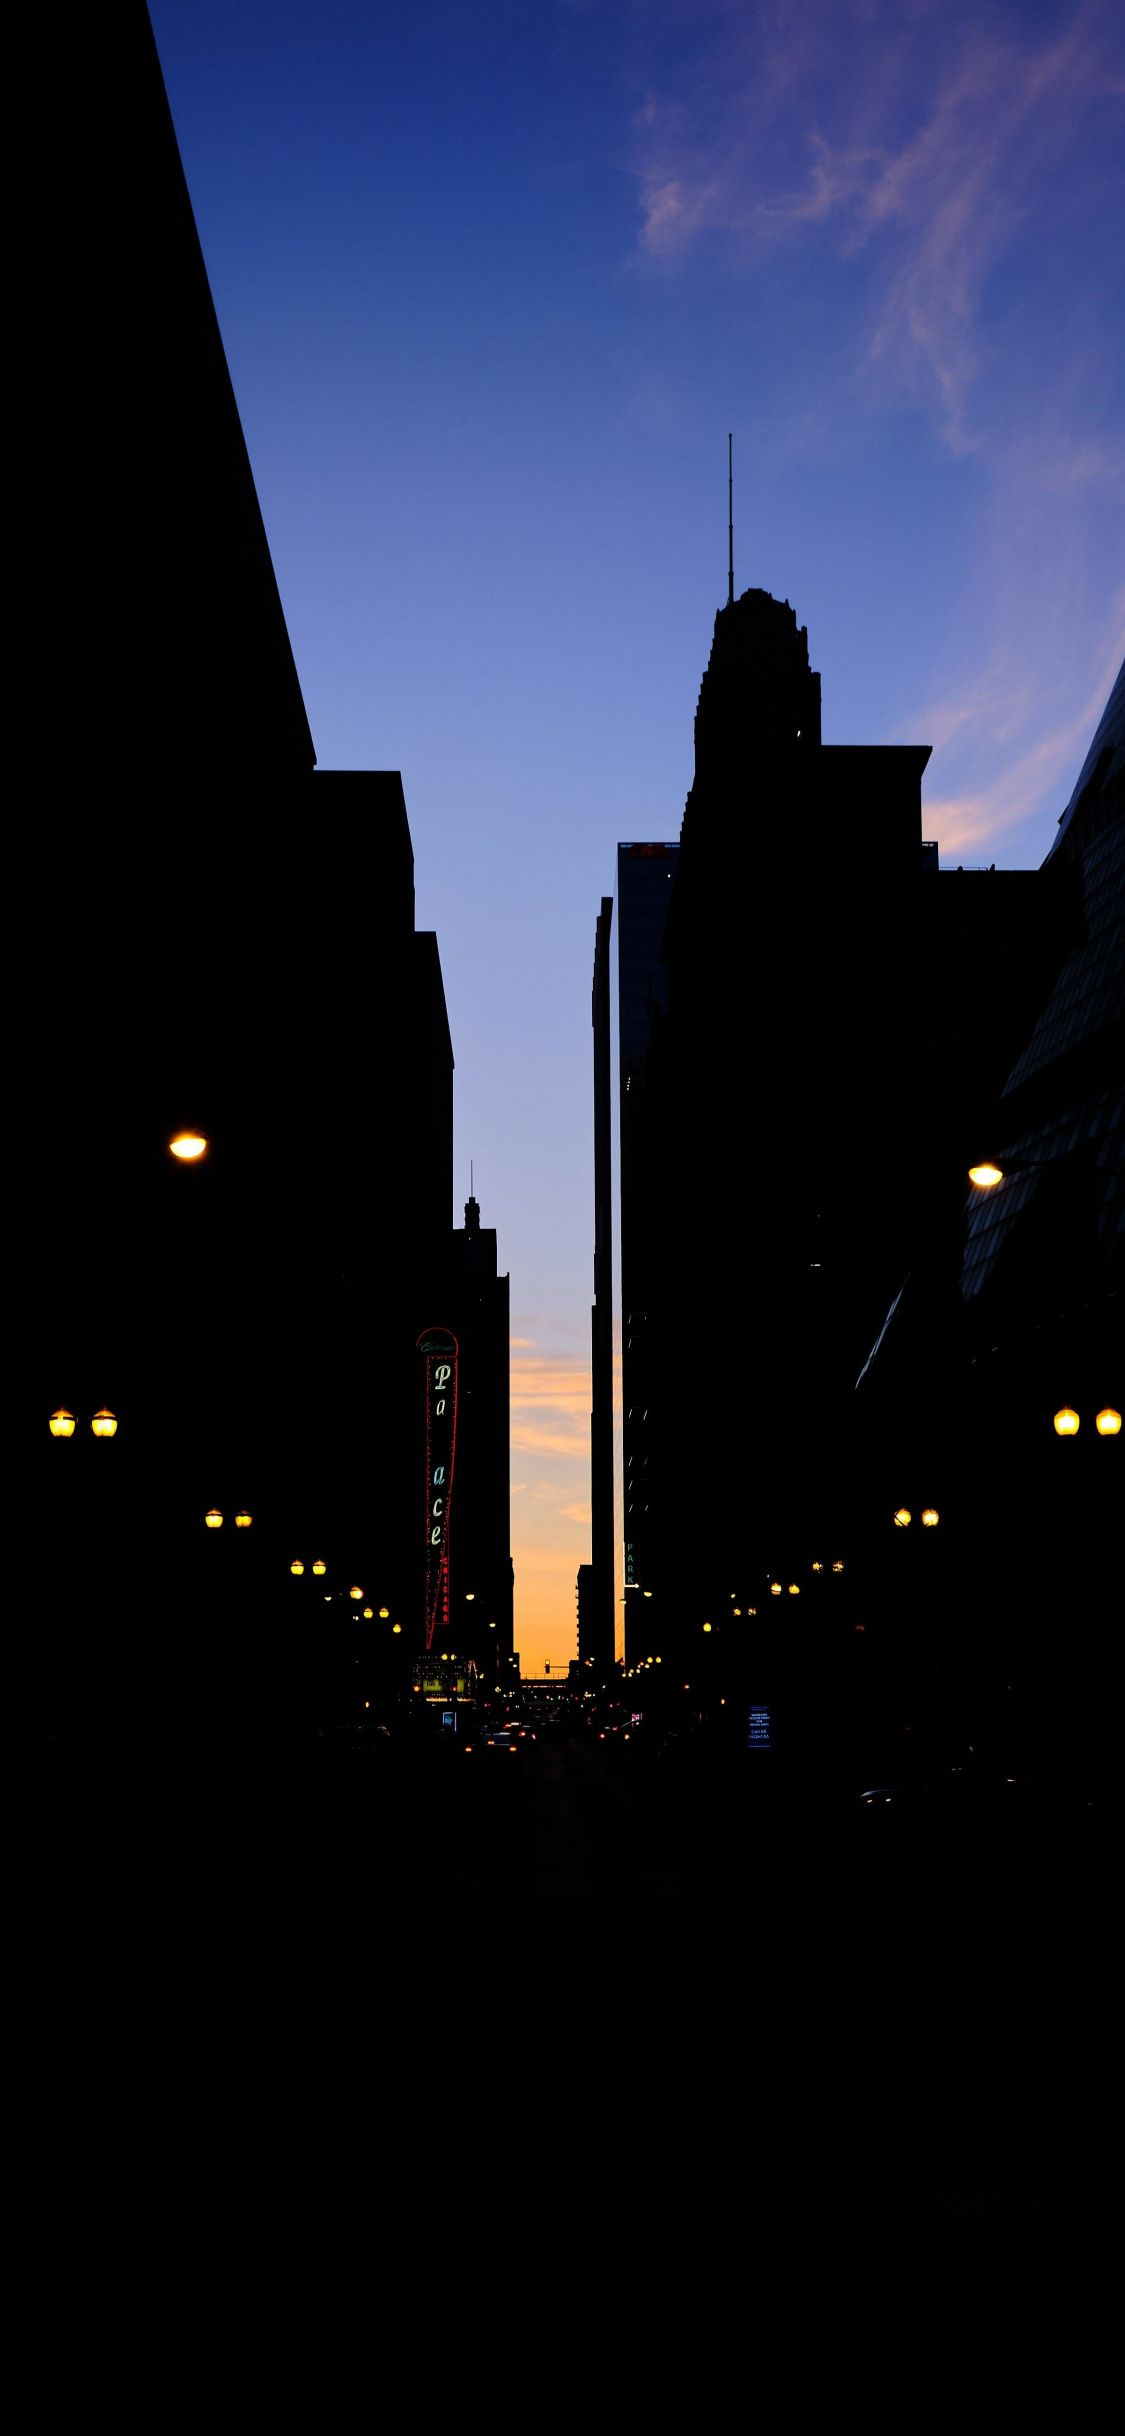 1125x2436 City Street Dark Buildings Silhouette Wallpaper Dark Wallpaper Cityscape Wallpaper City Wallpaper